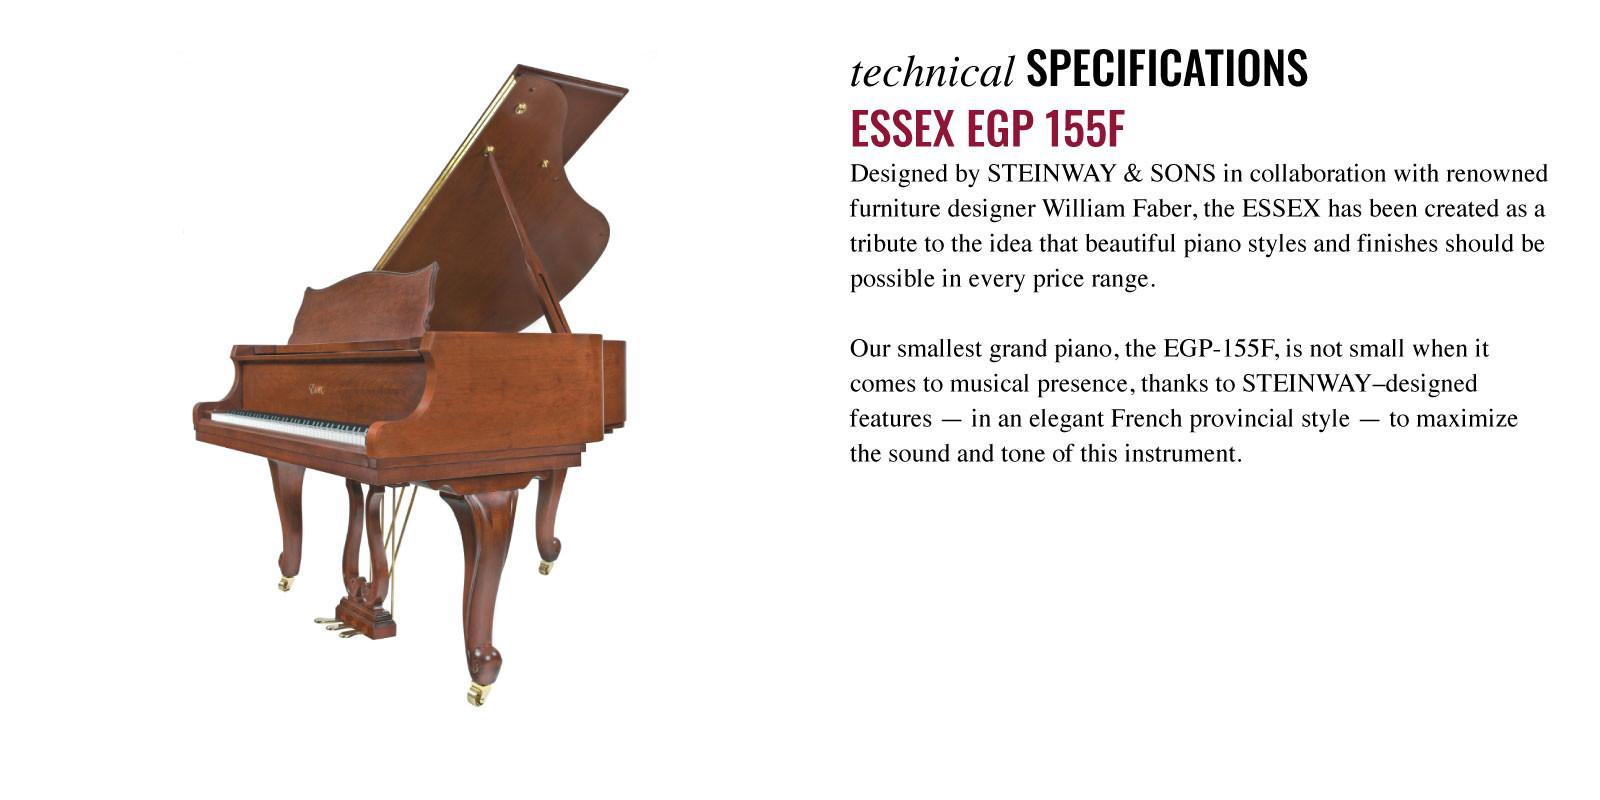 PP-Essex-EGP-155F-Details-1.jpg